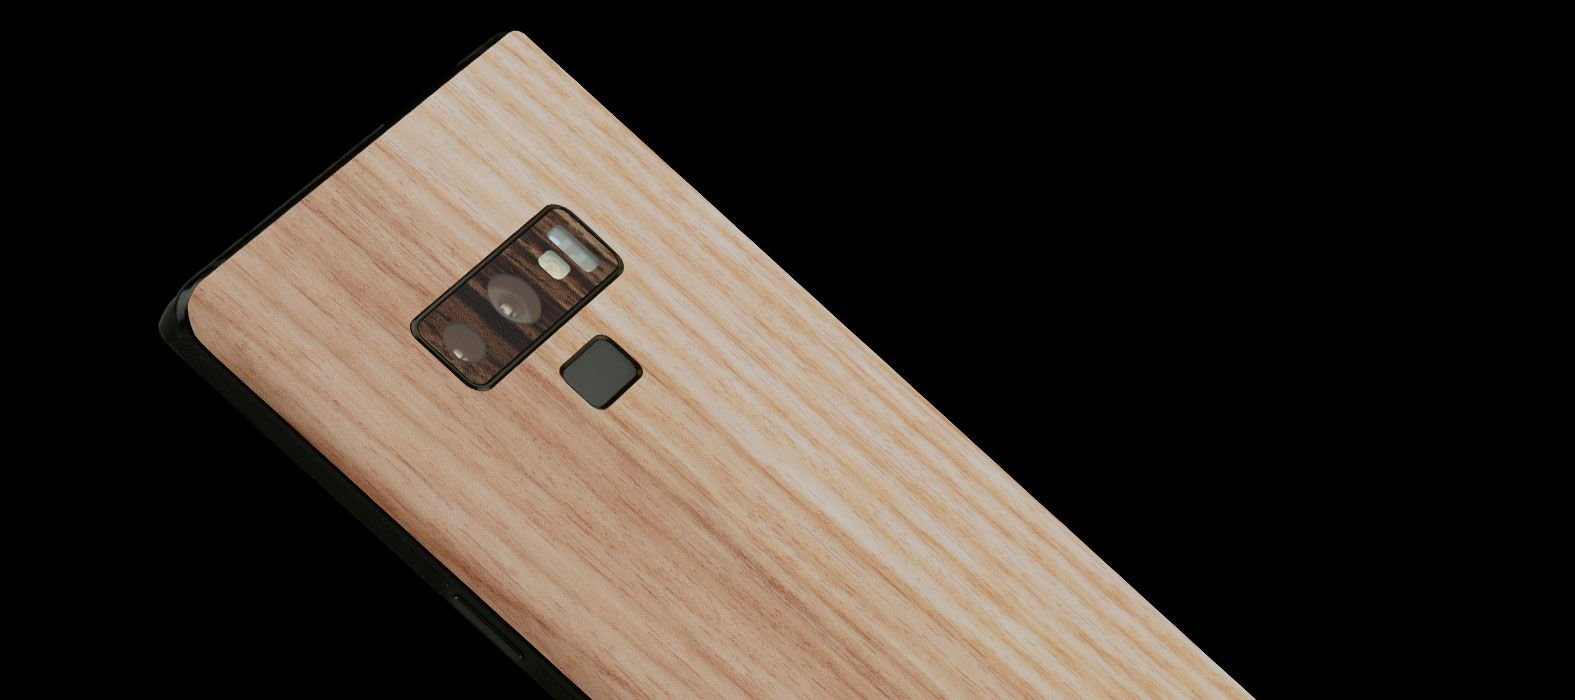 Galaxy Note 9 Bamboo Wood Skins